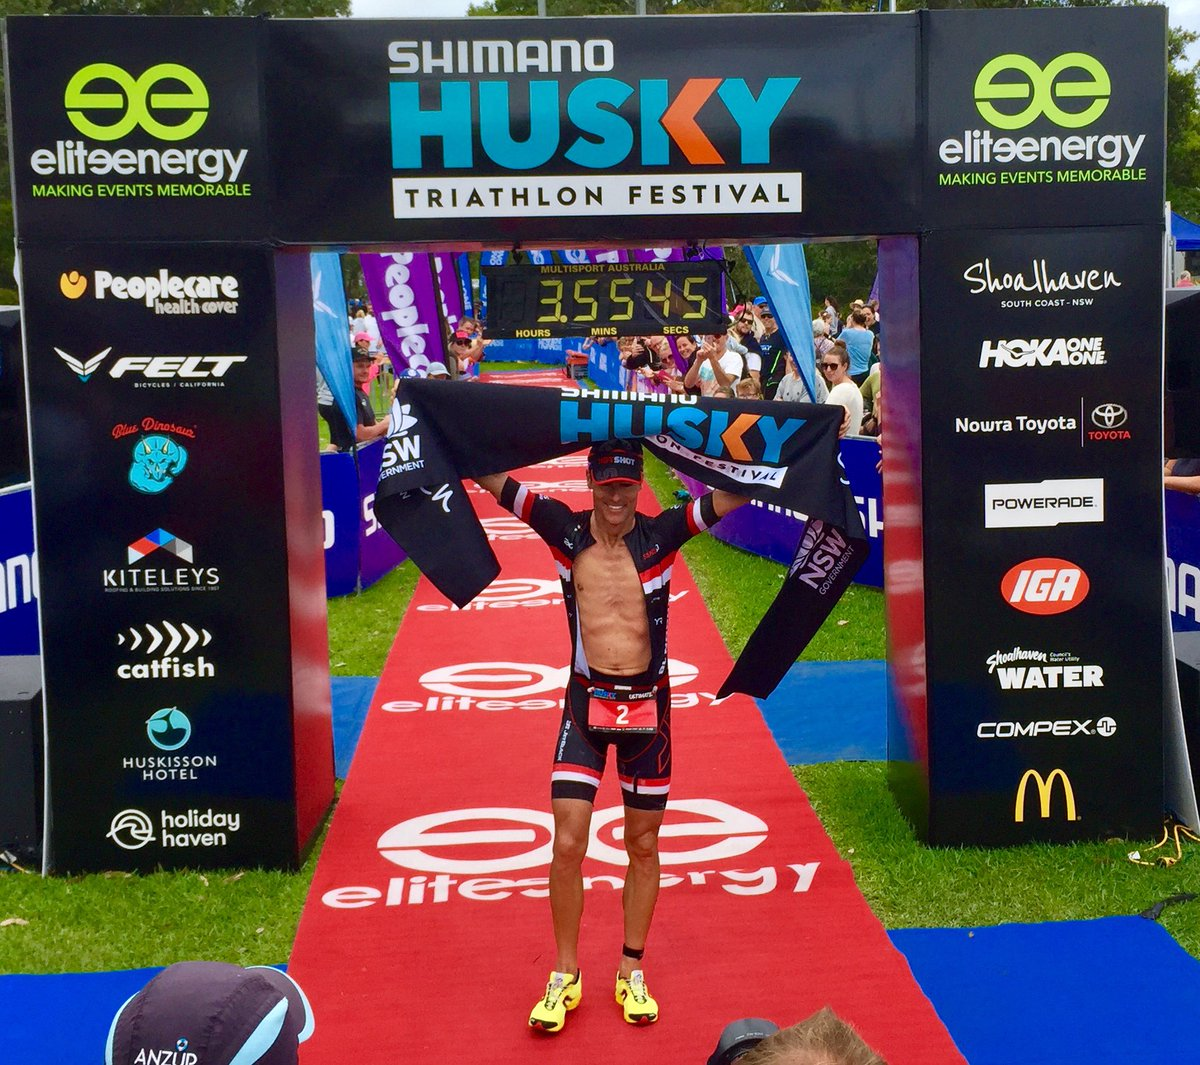 45-jarige Crowie wint halve triatlon in Australië